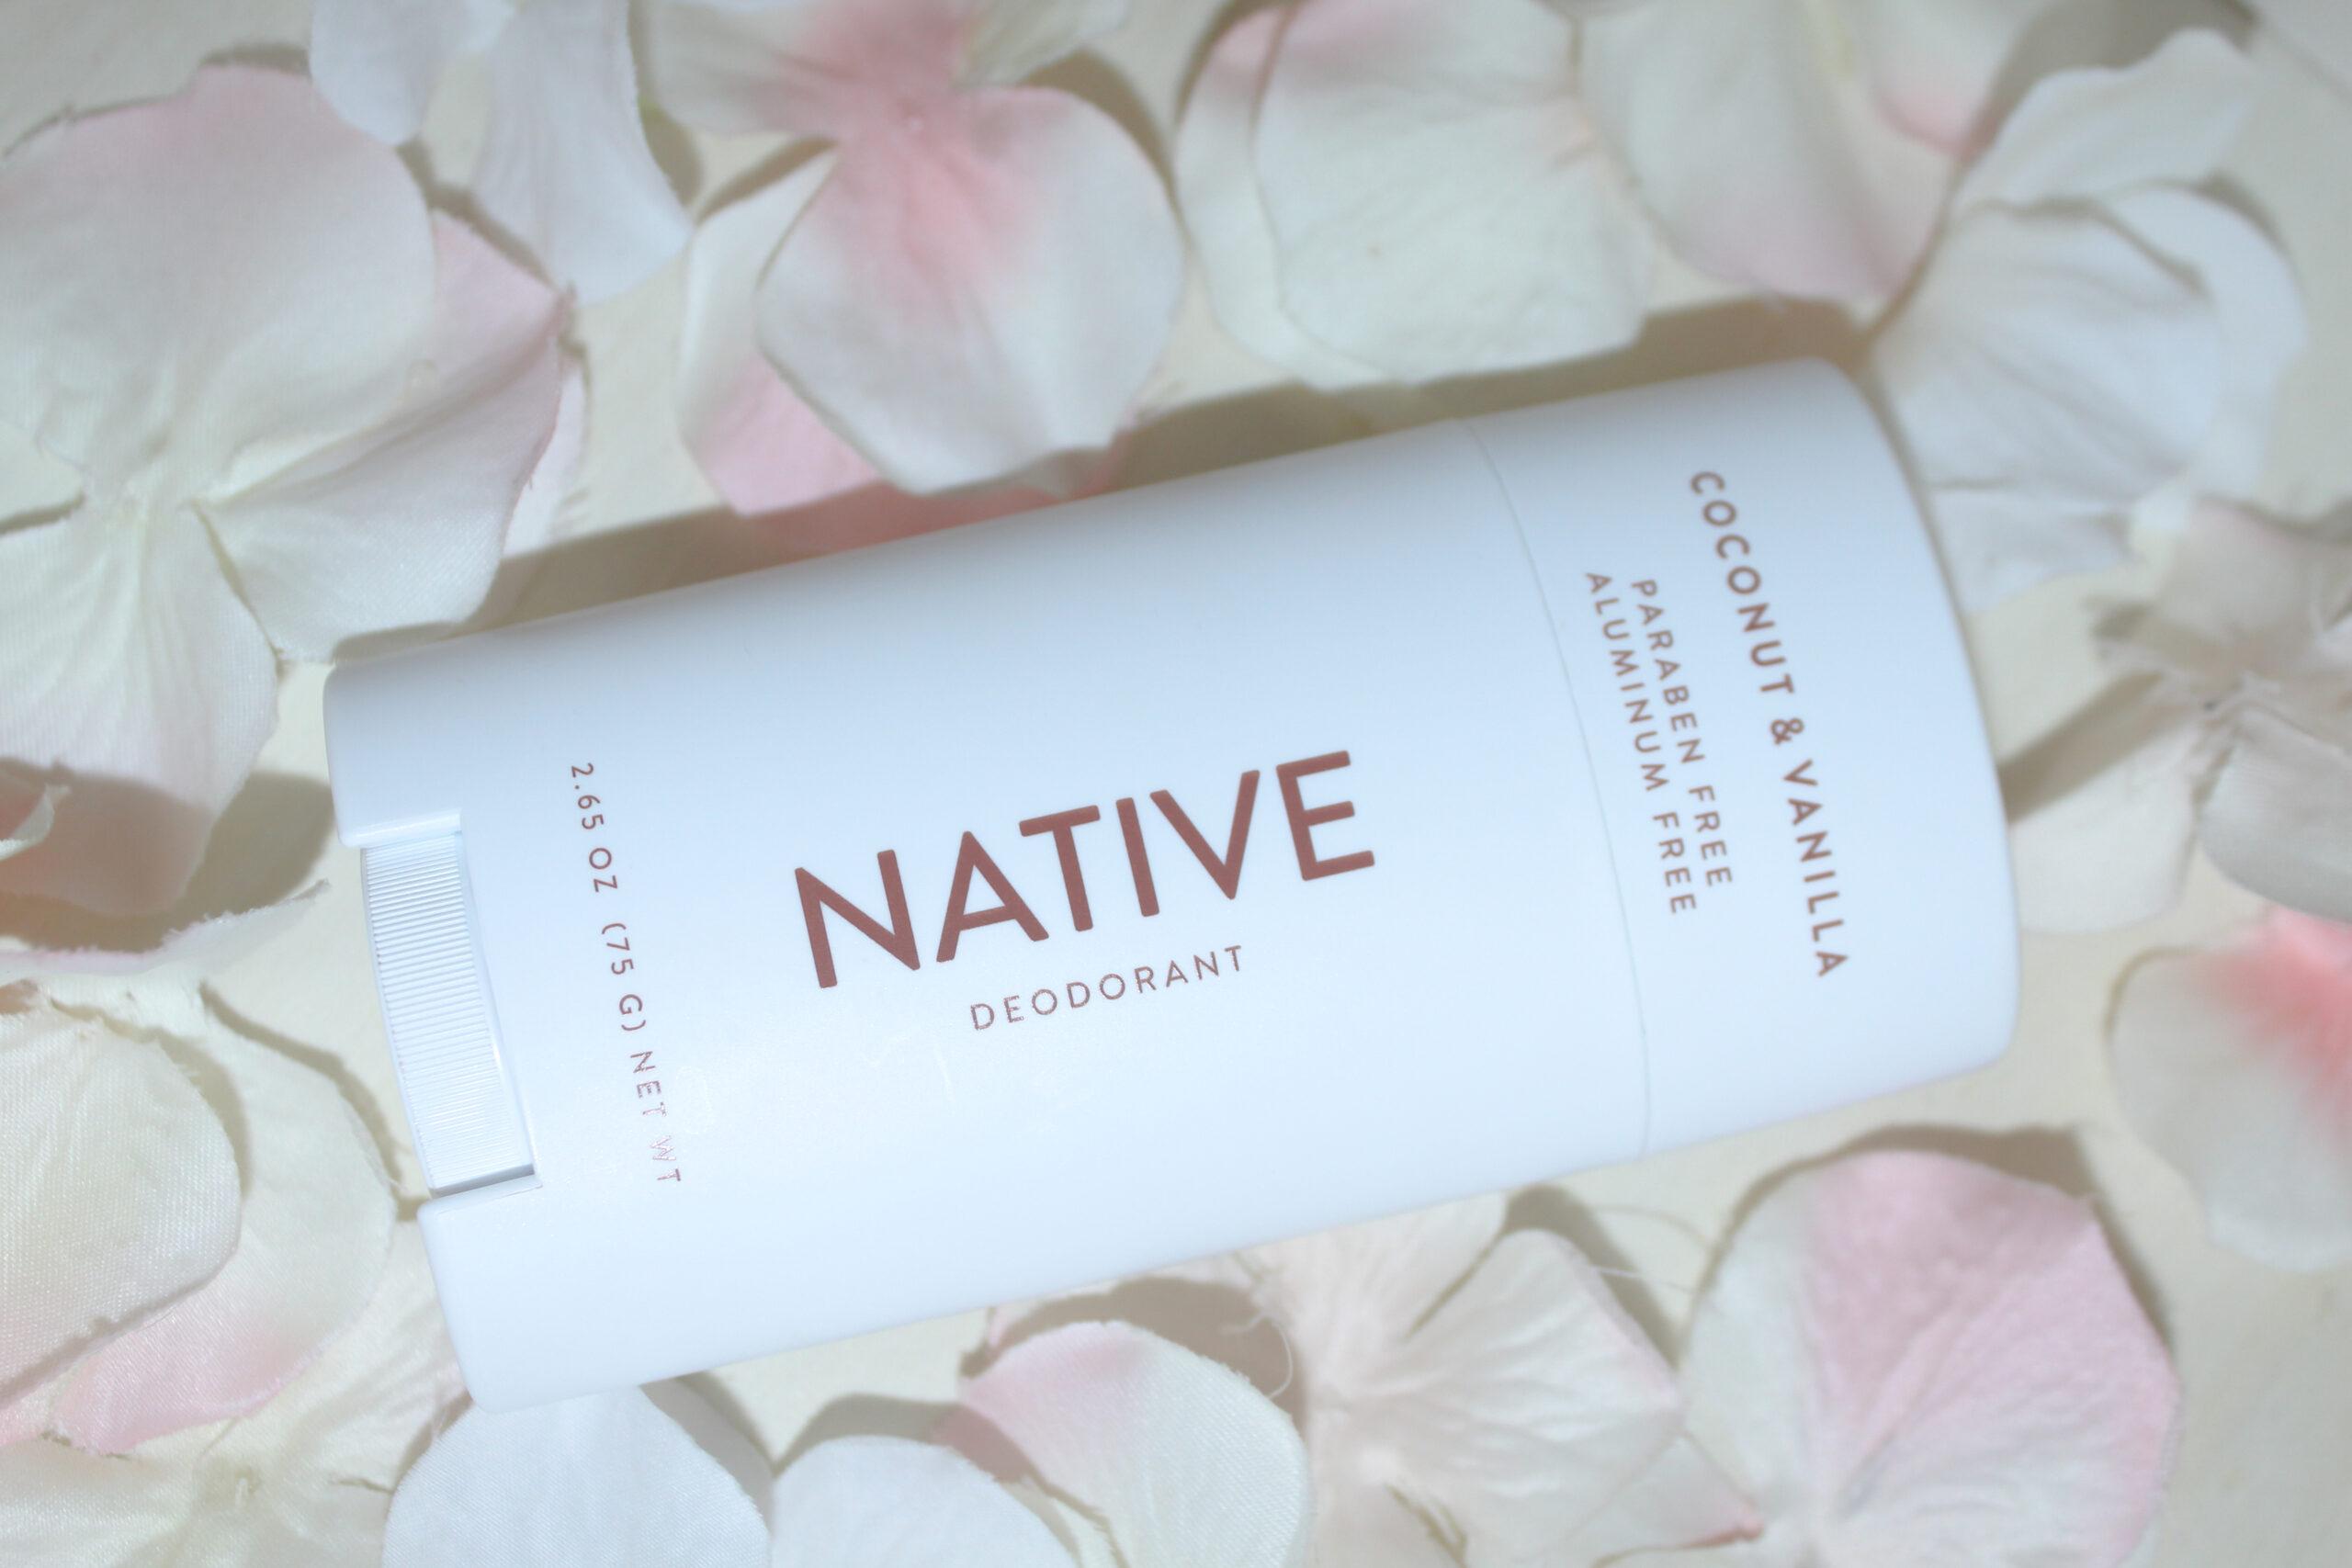 Native Deodorant Coconut Vainilla, best aluminum free deorderant that actually works